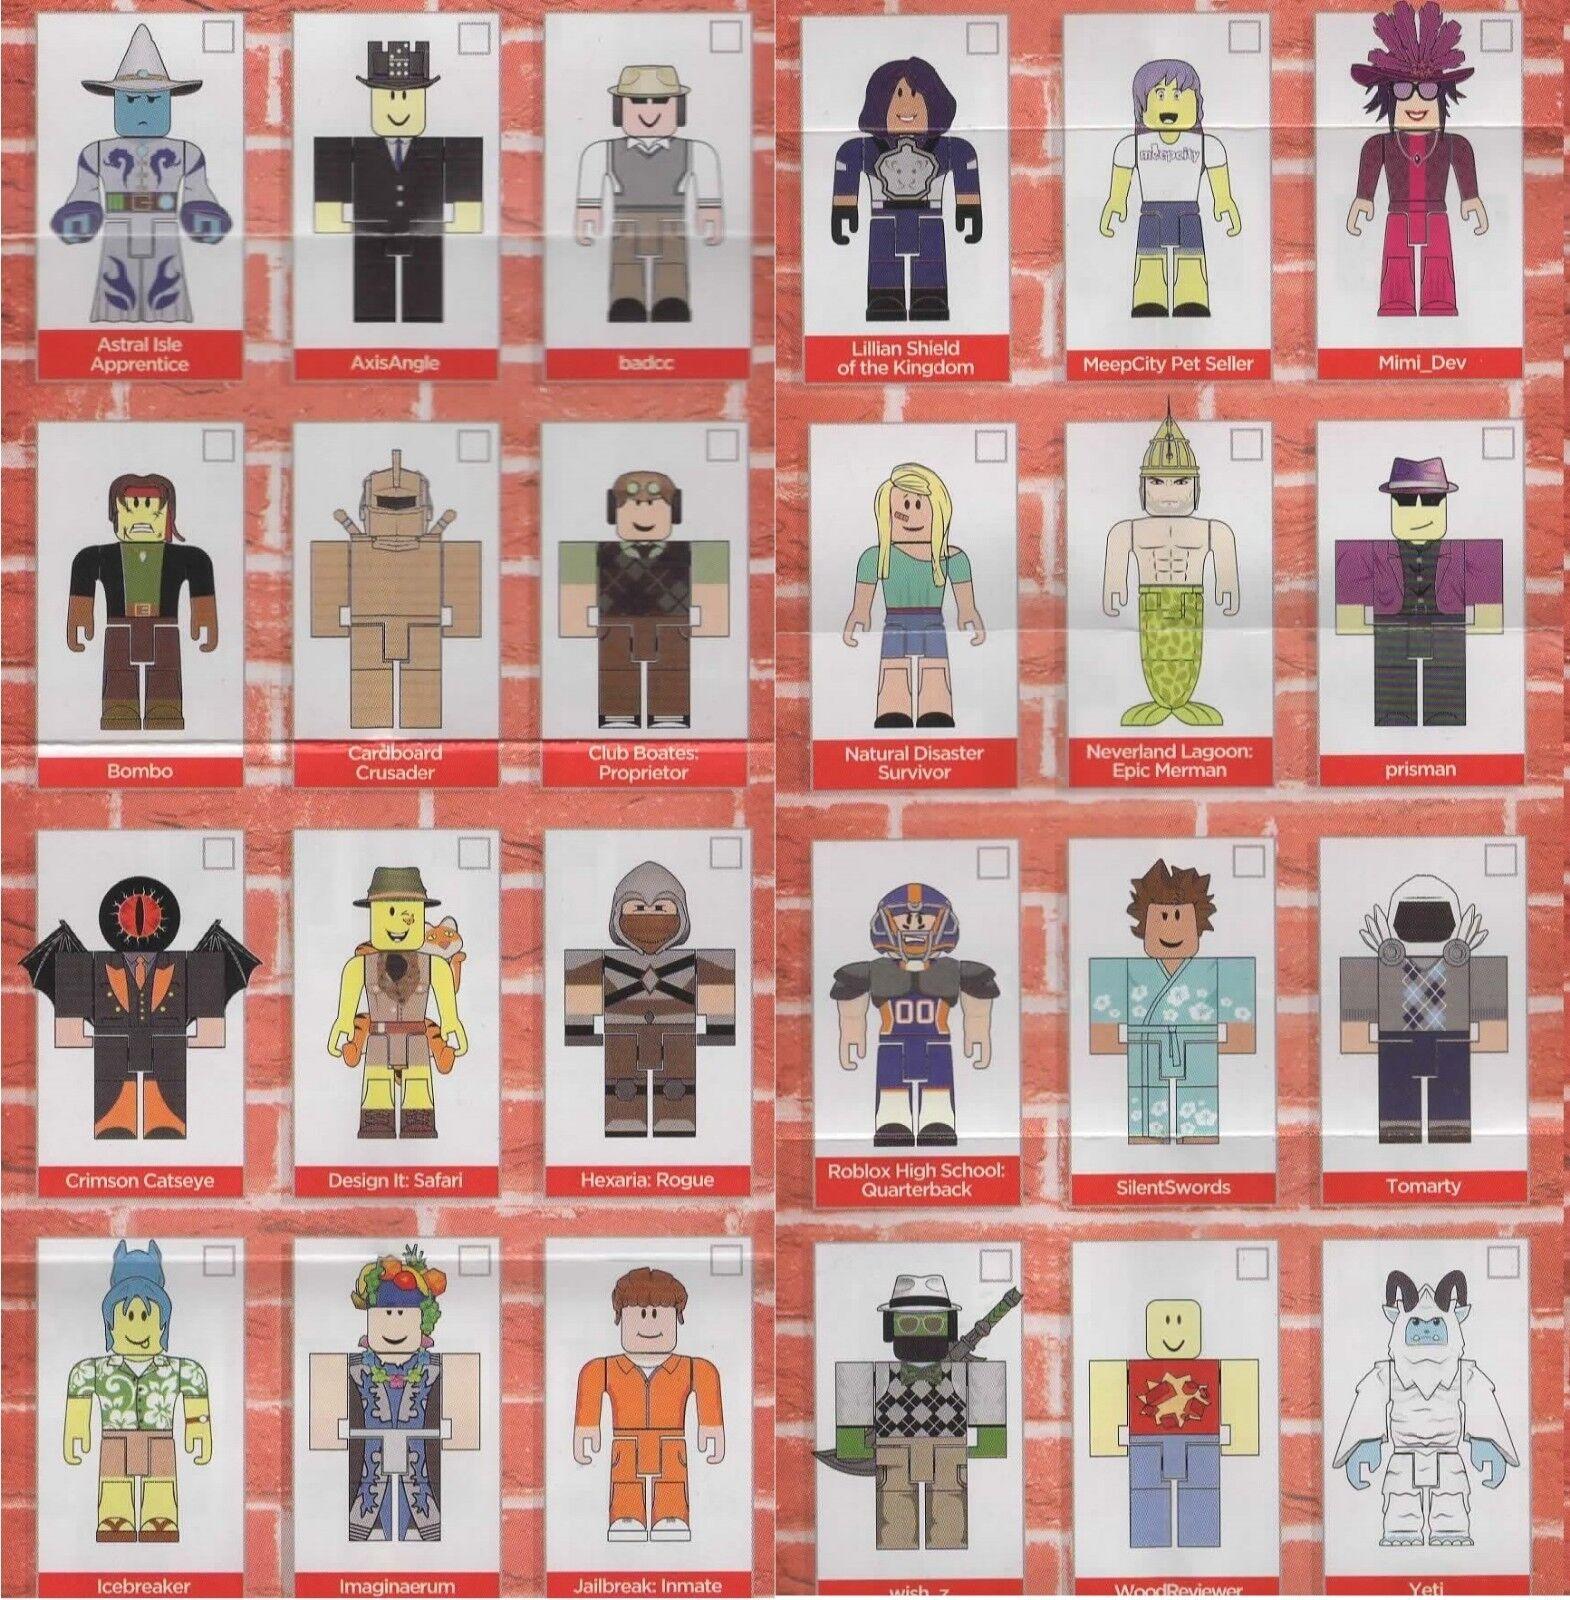 Roblox Series 4 - Roblox Red Brick Series 4 Action Figures Unused Codes